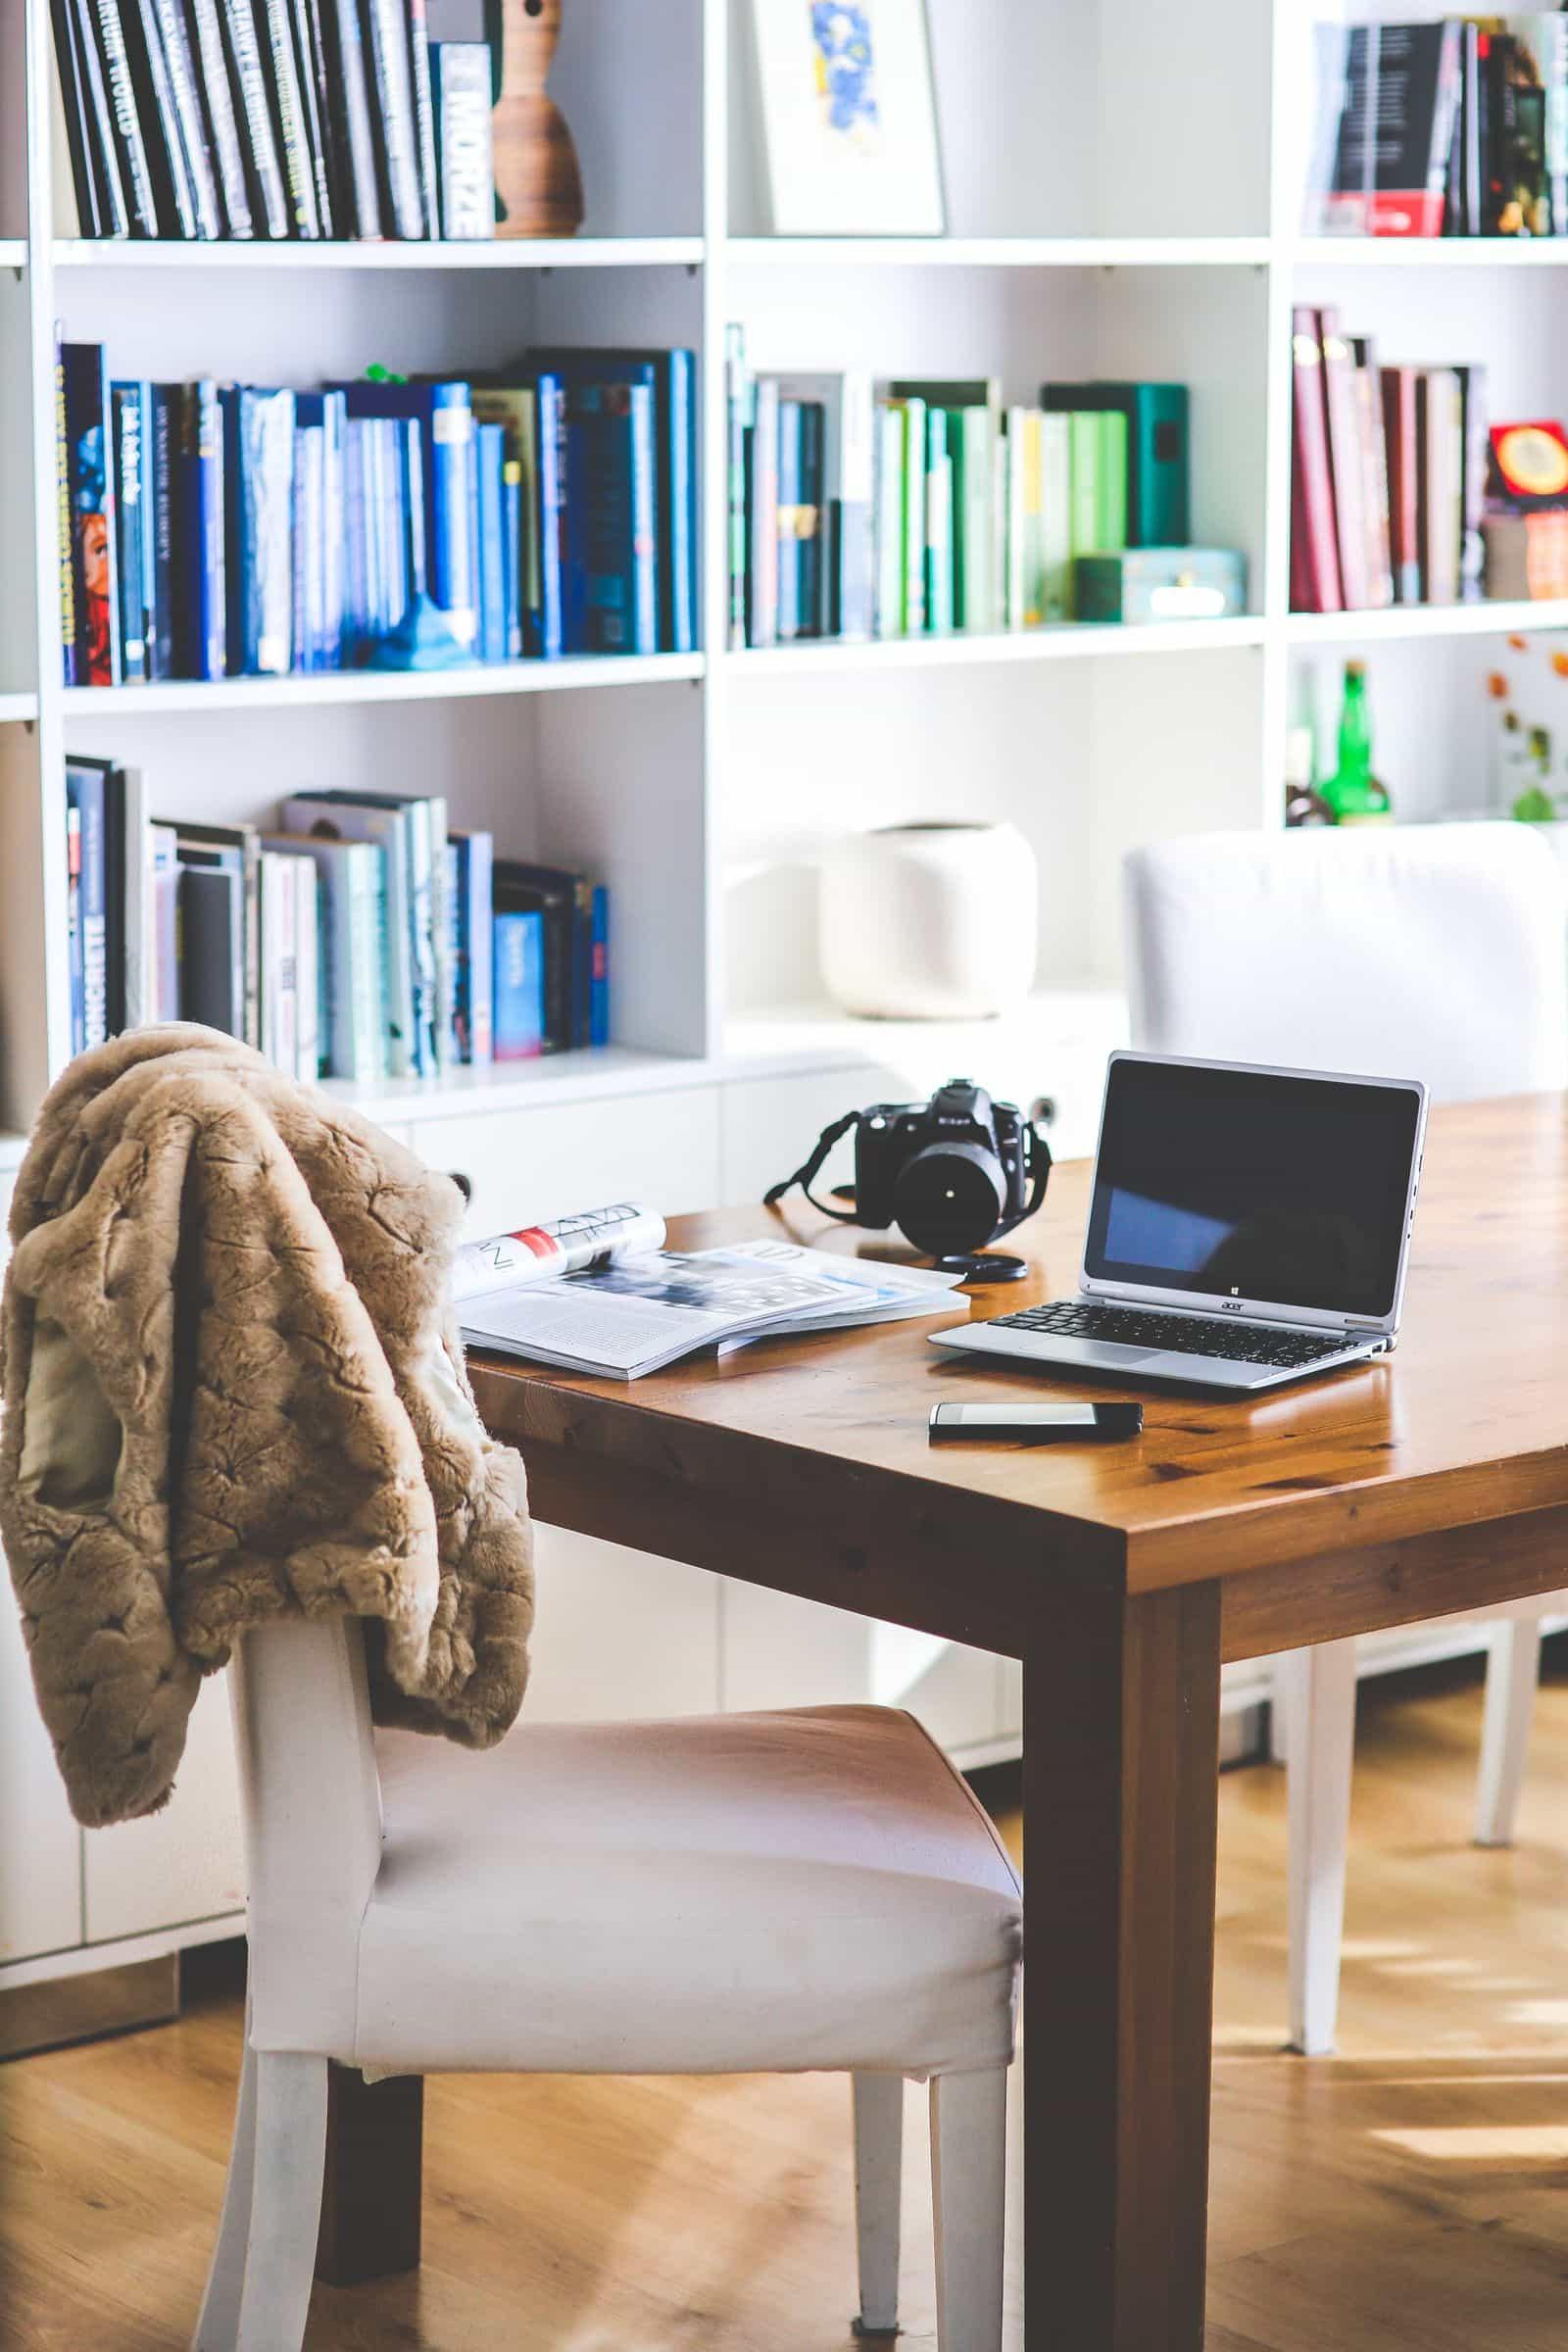 Home office with rainbow bookshelves